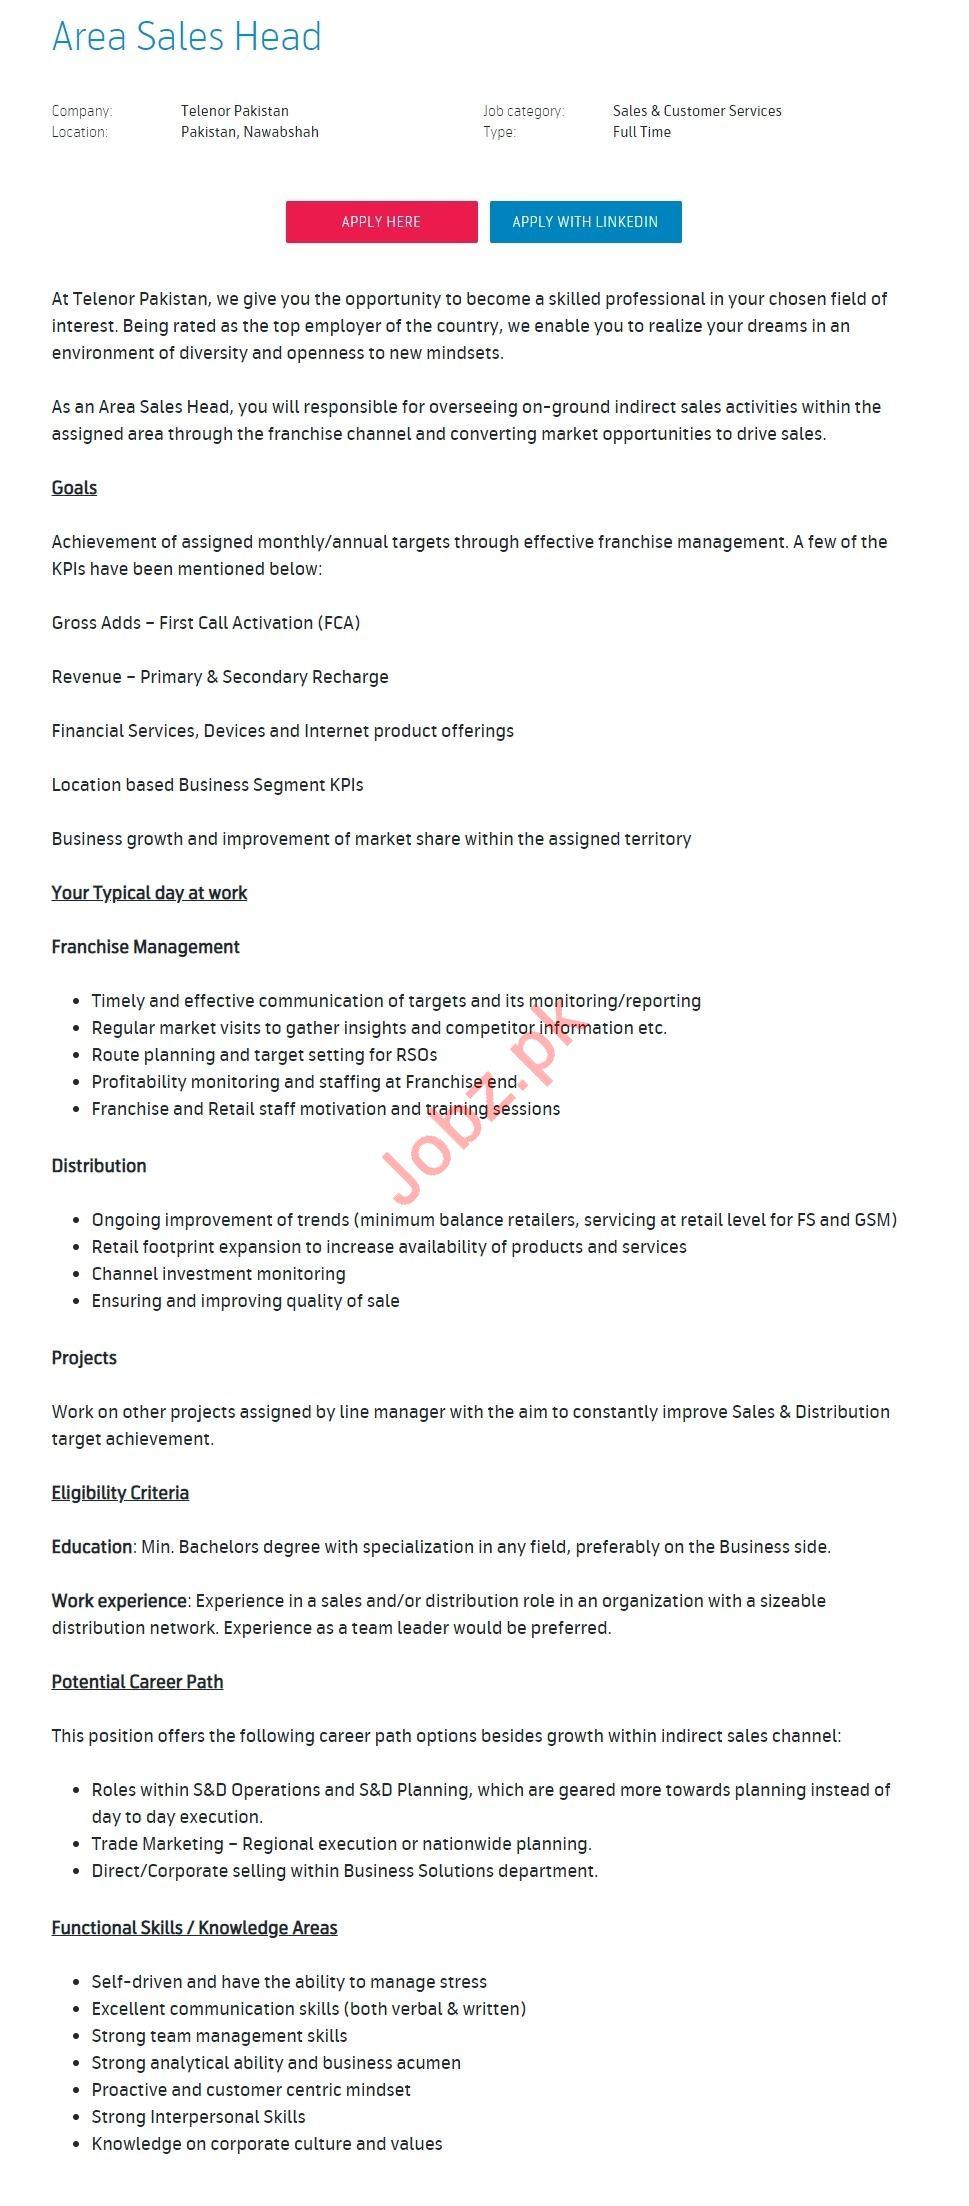 Area Sales Head Jobs 2019 in Nawabshah